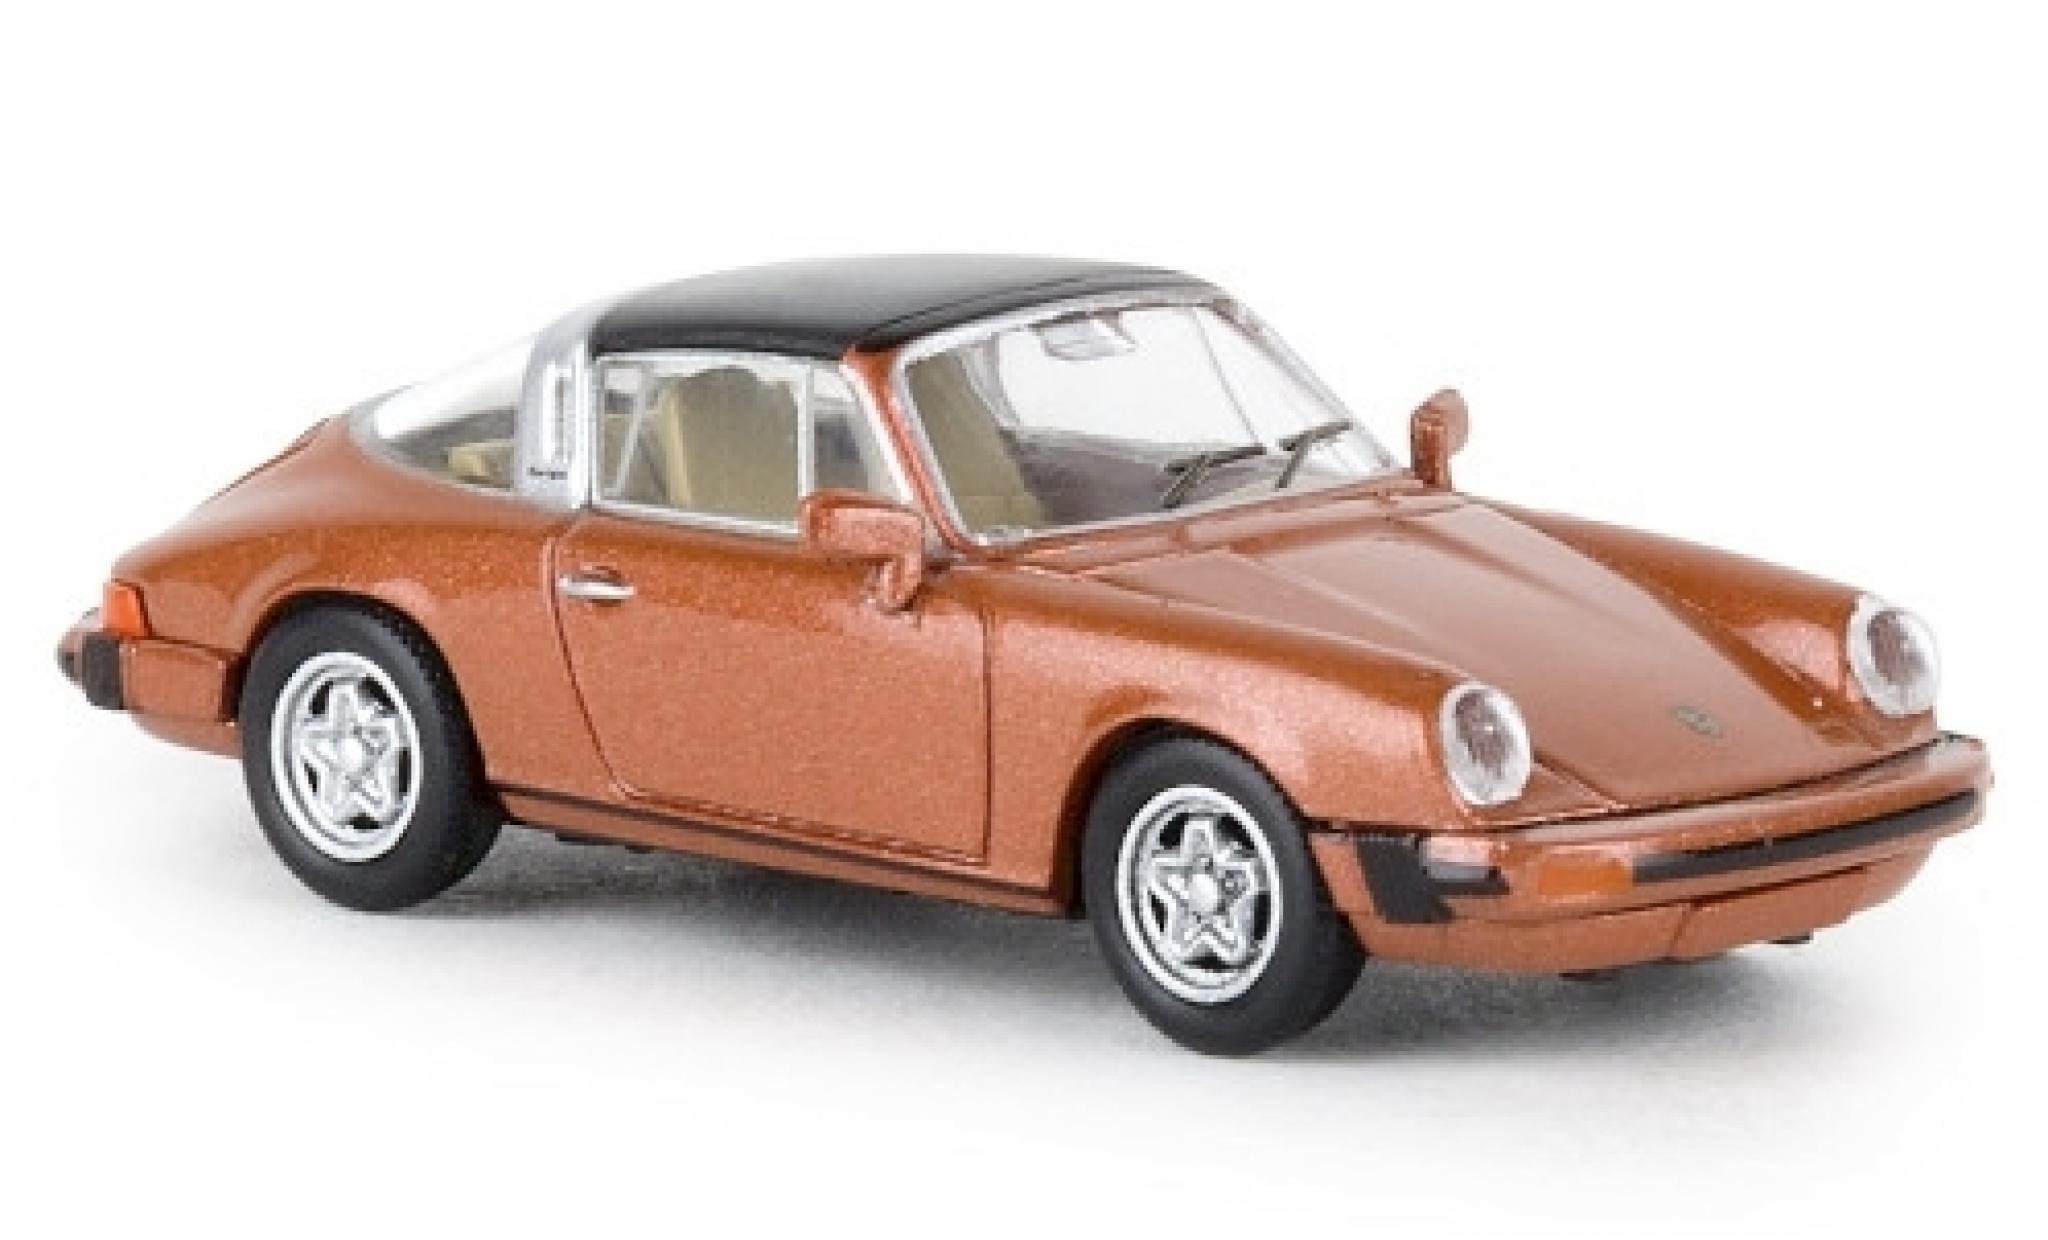 Porsche 930 Targa 1/87 Brekina 911 G targa metallise orange 1976 TD